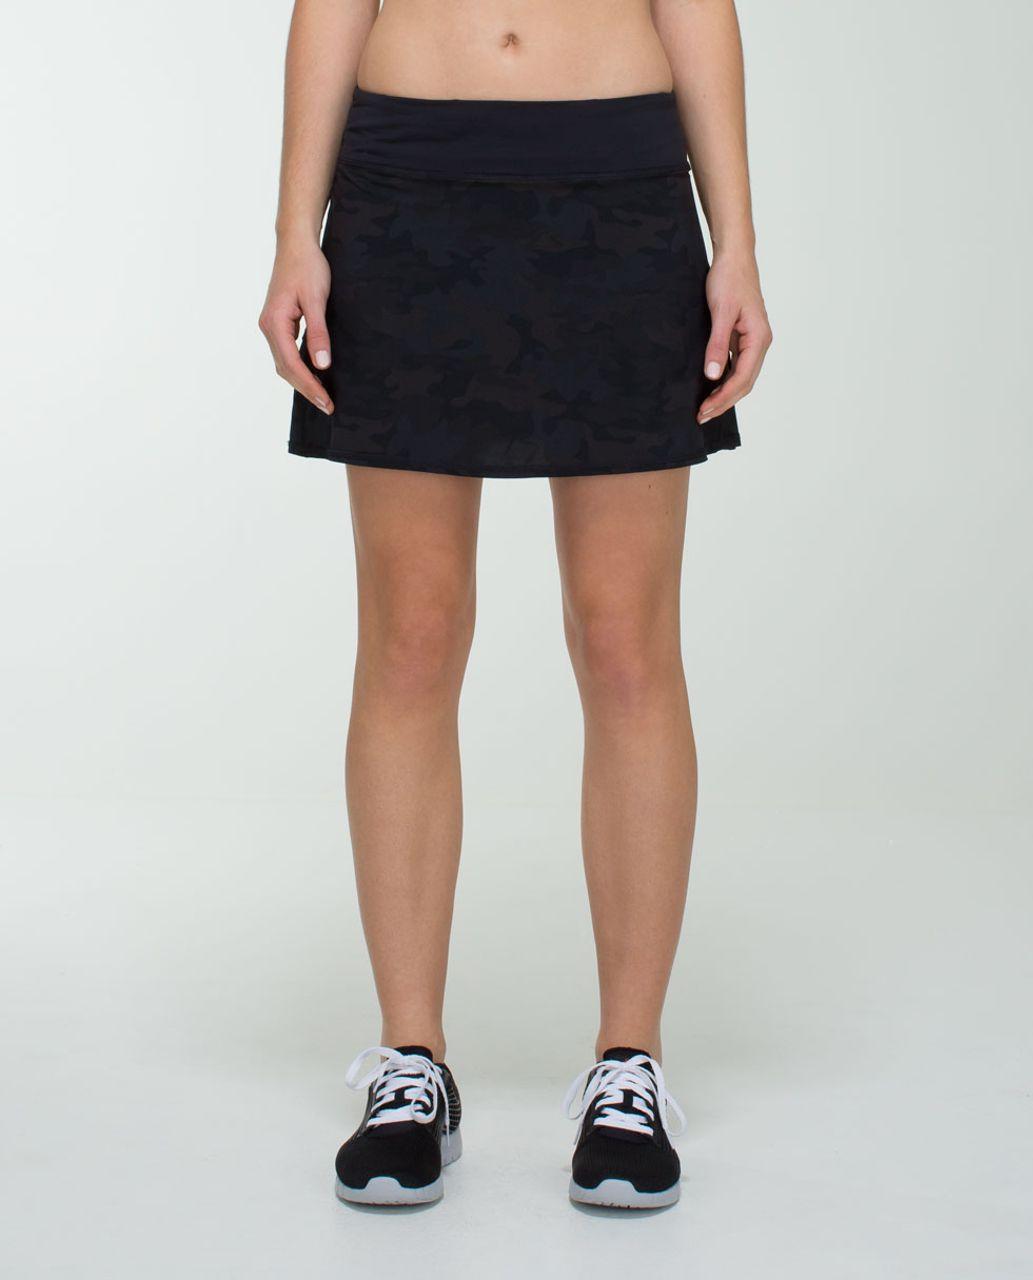 Lululemon Run:  Pace Setter Skirt (Tall) *4-way Stretch - Savasana Camo 20cm New Black / Black